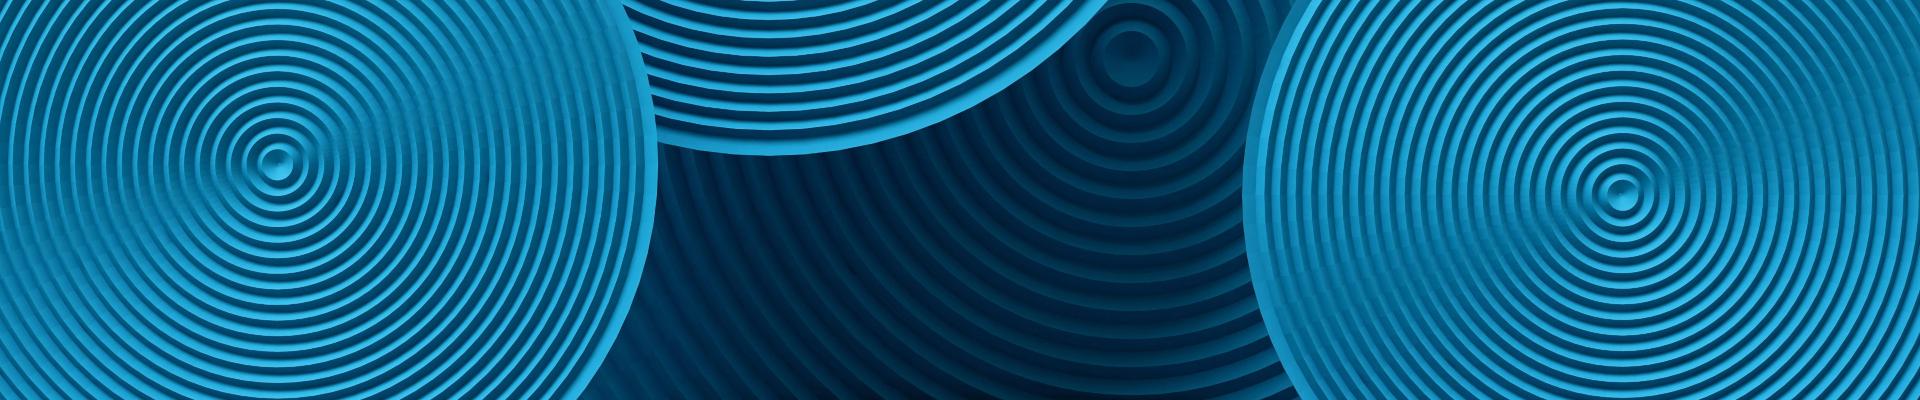 3d blue circular objects